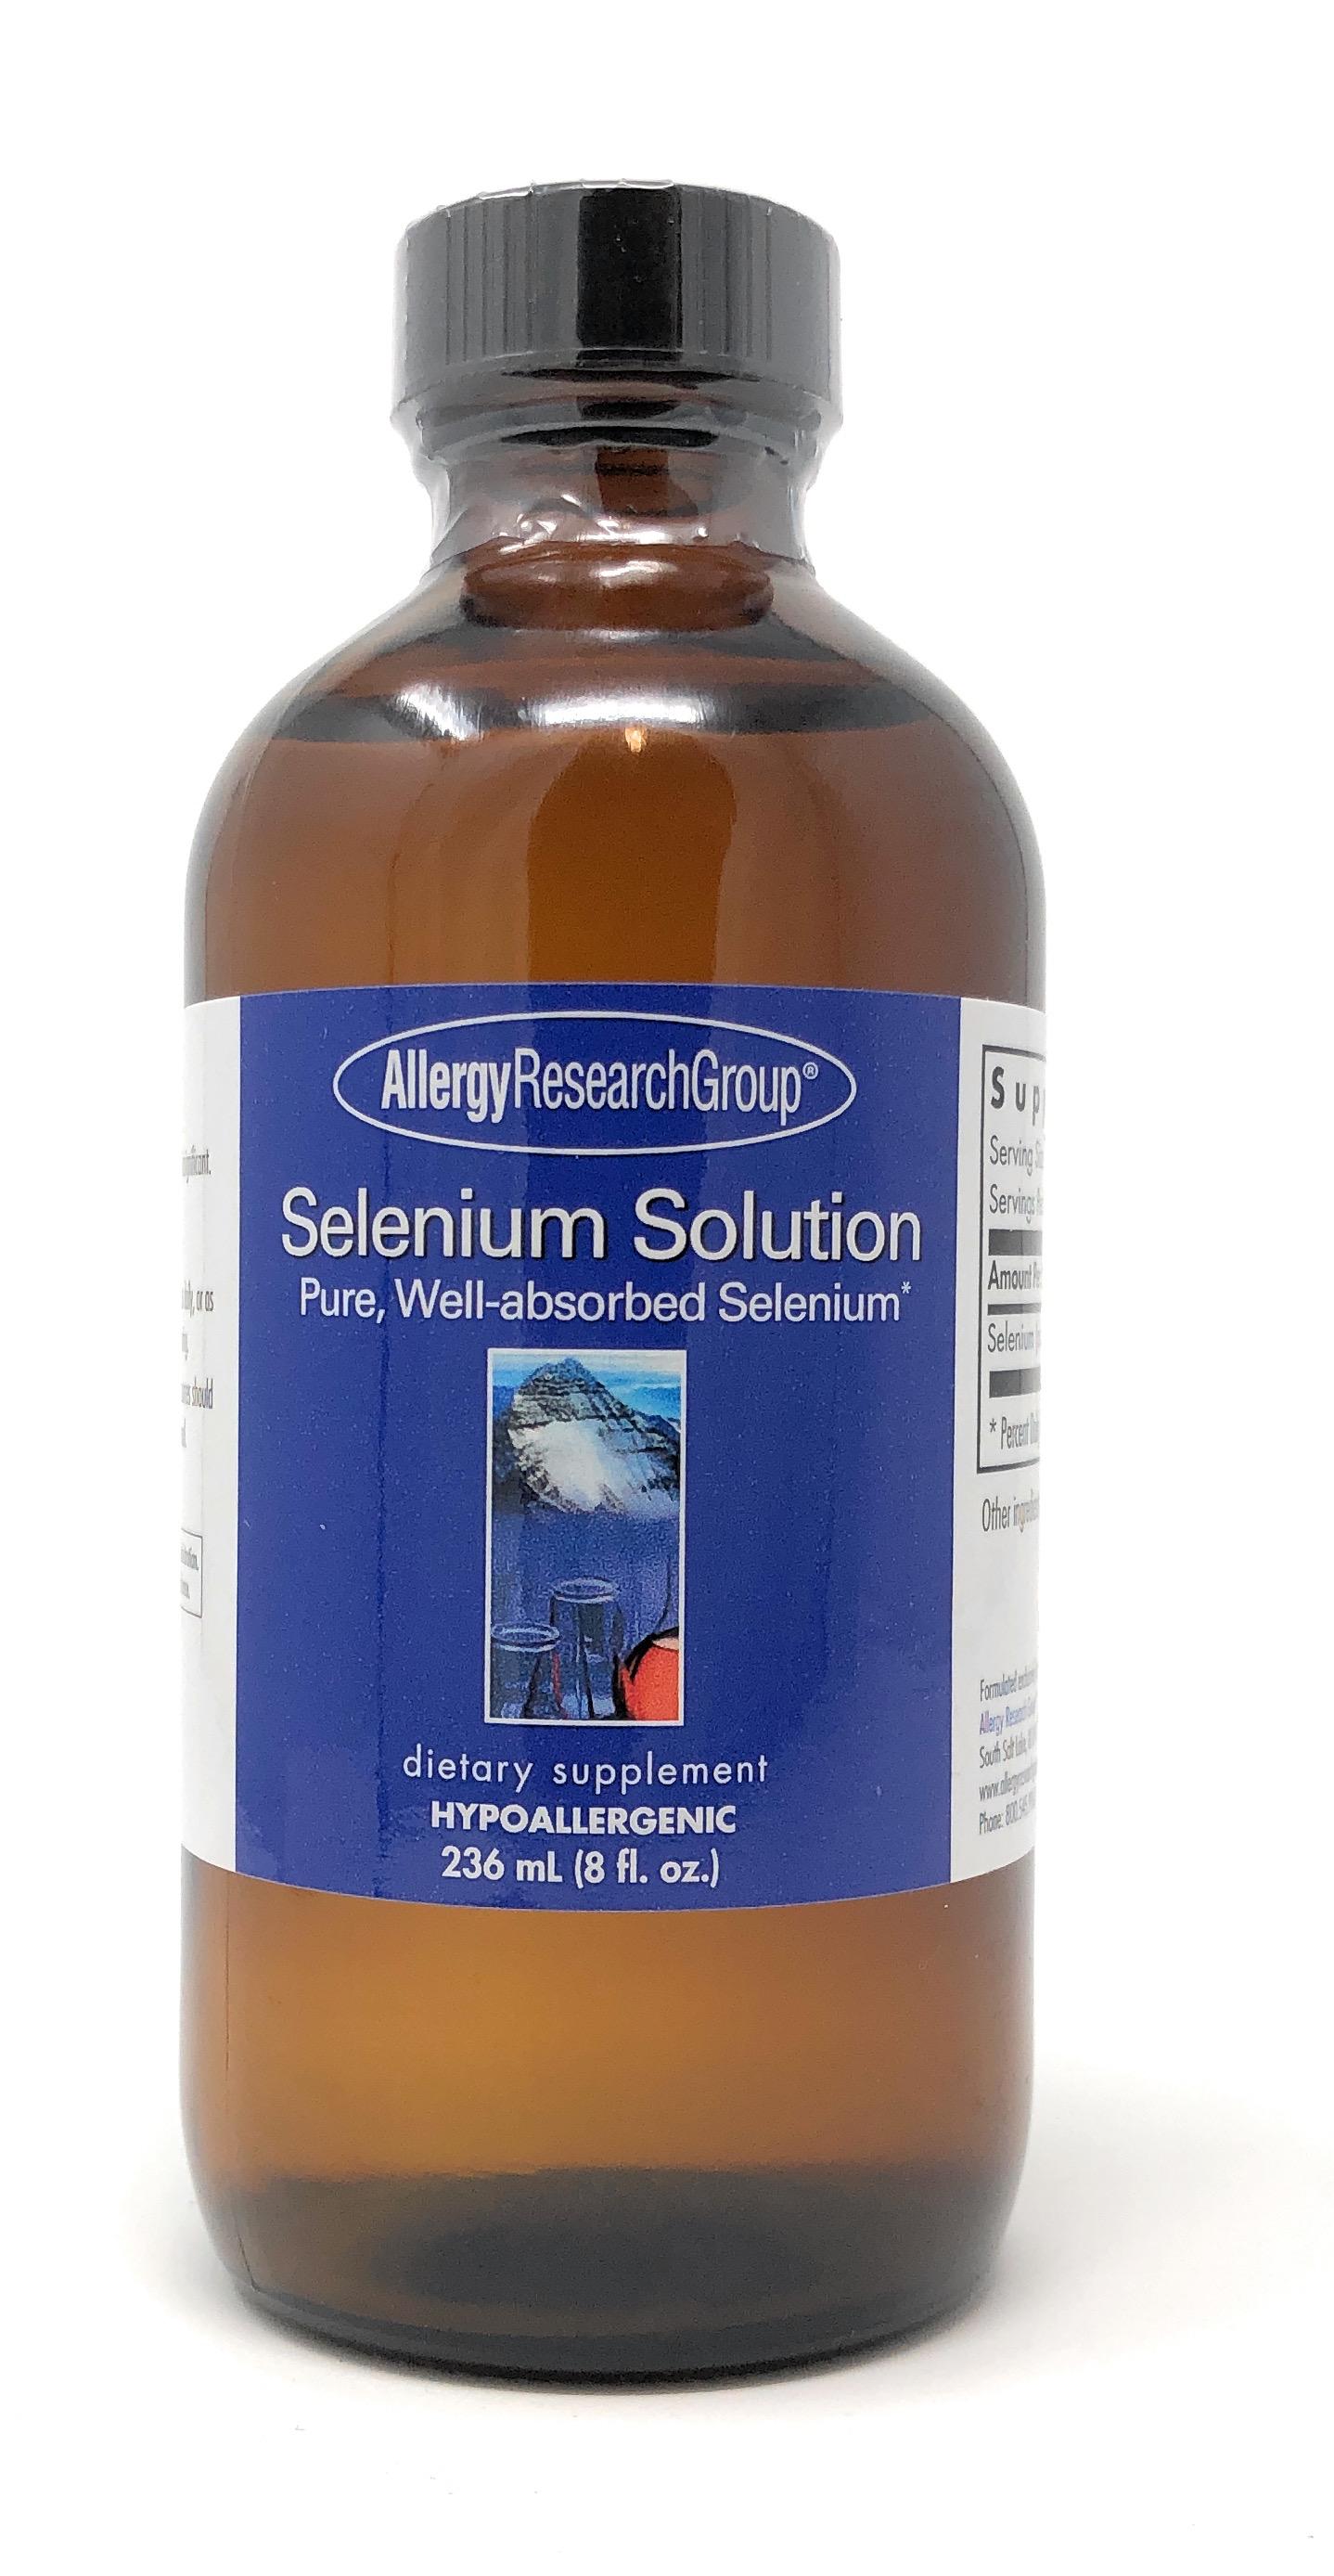 Allergy Research Group Selenium Solution (Natriumselenit, flüssig) 236 ml (8 oz.)